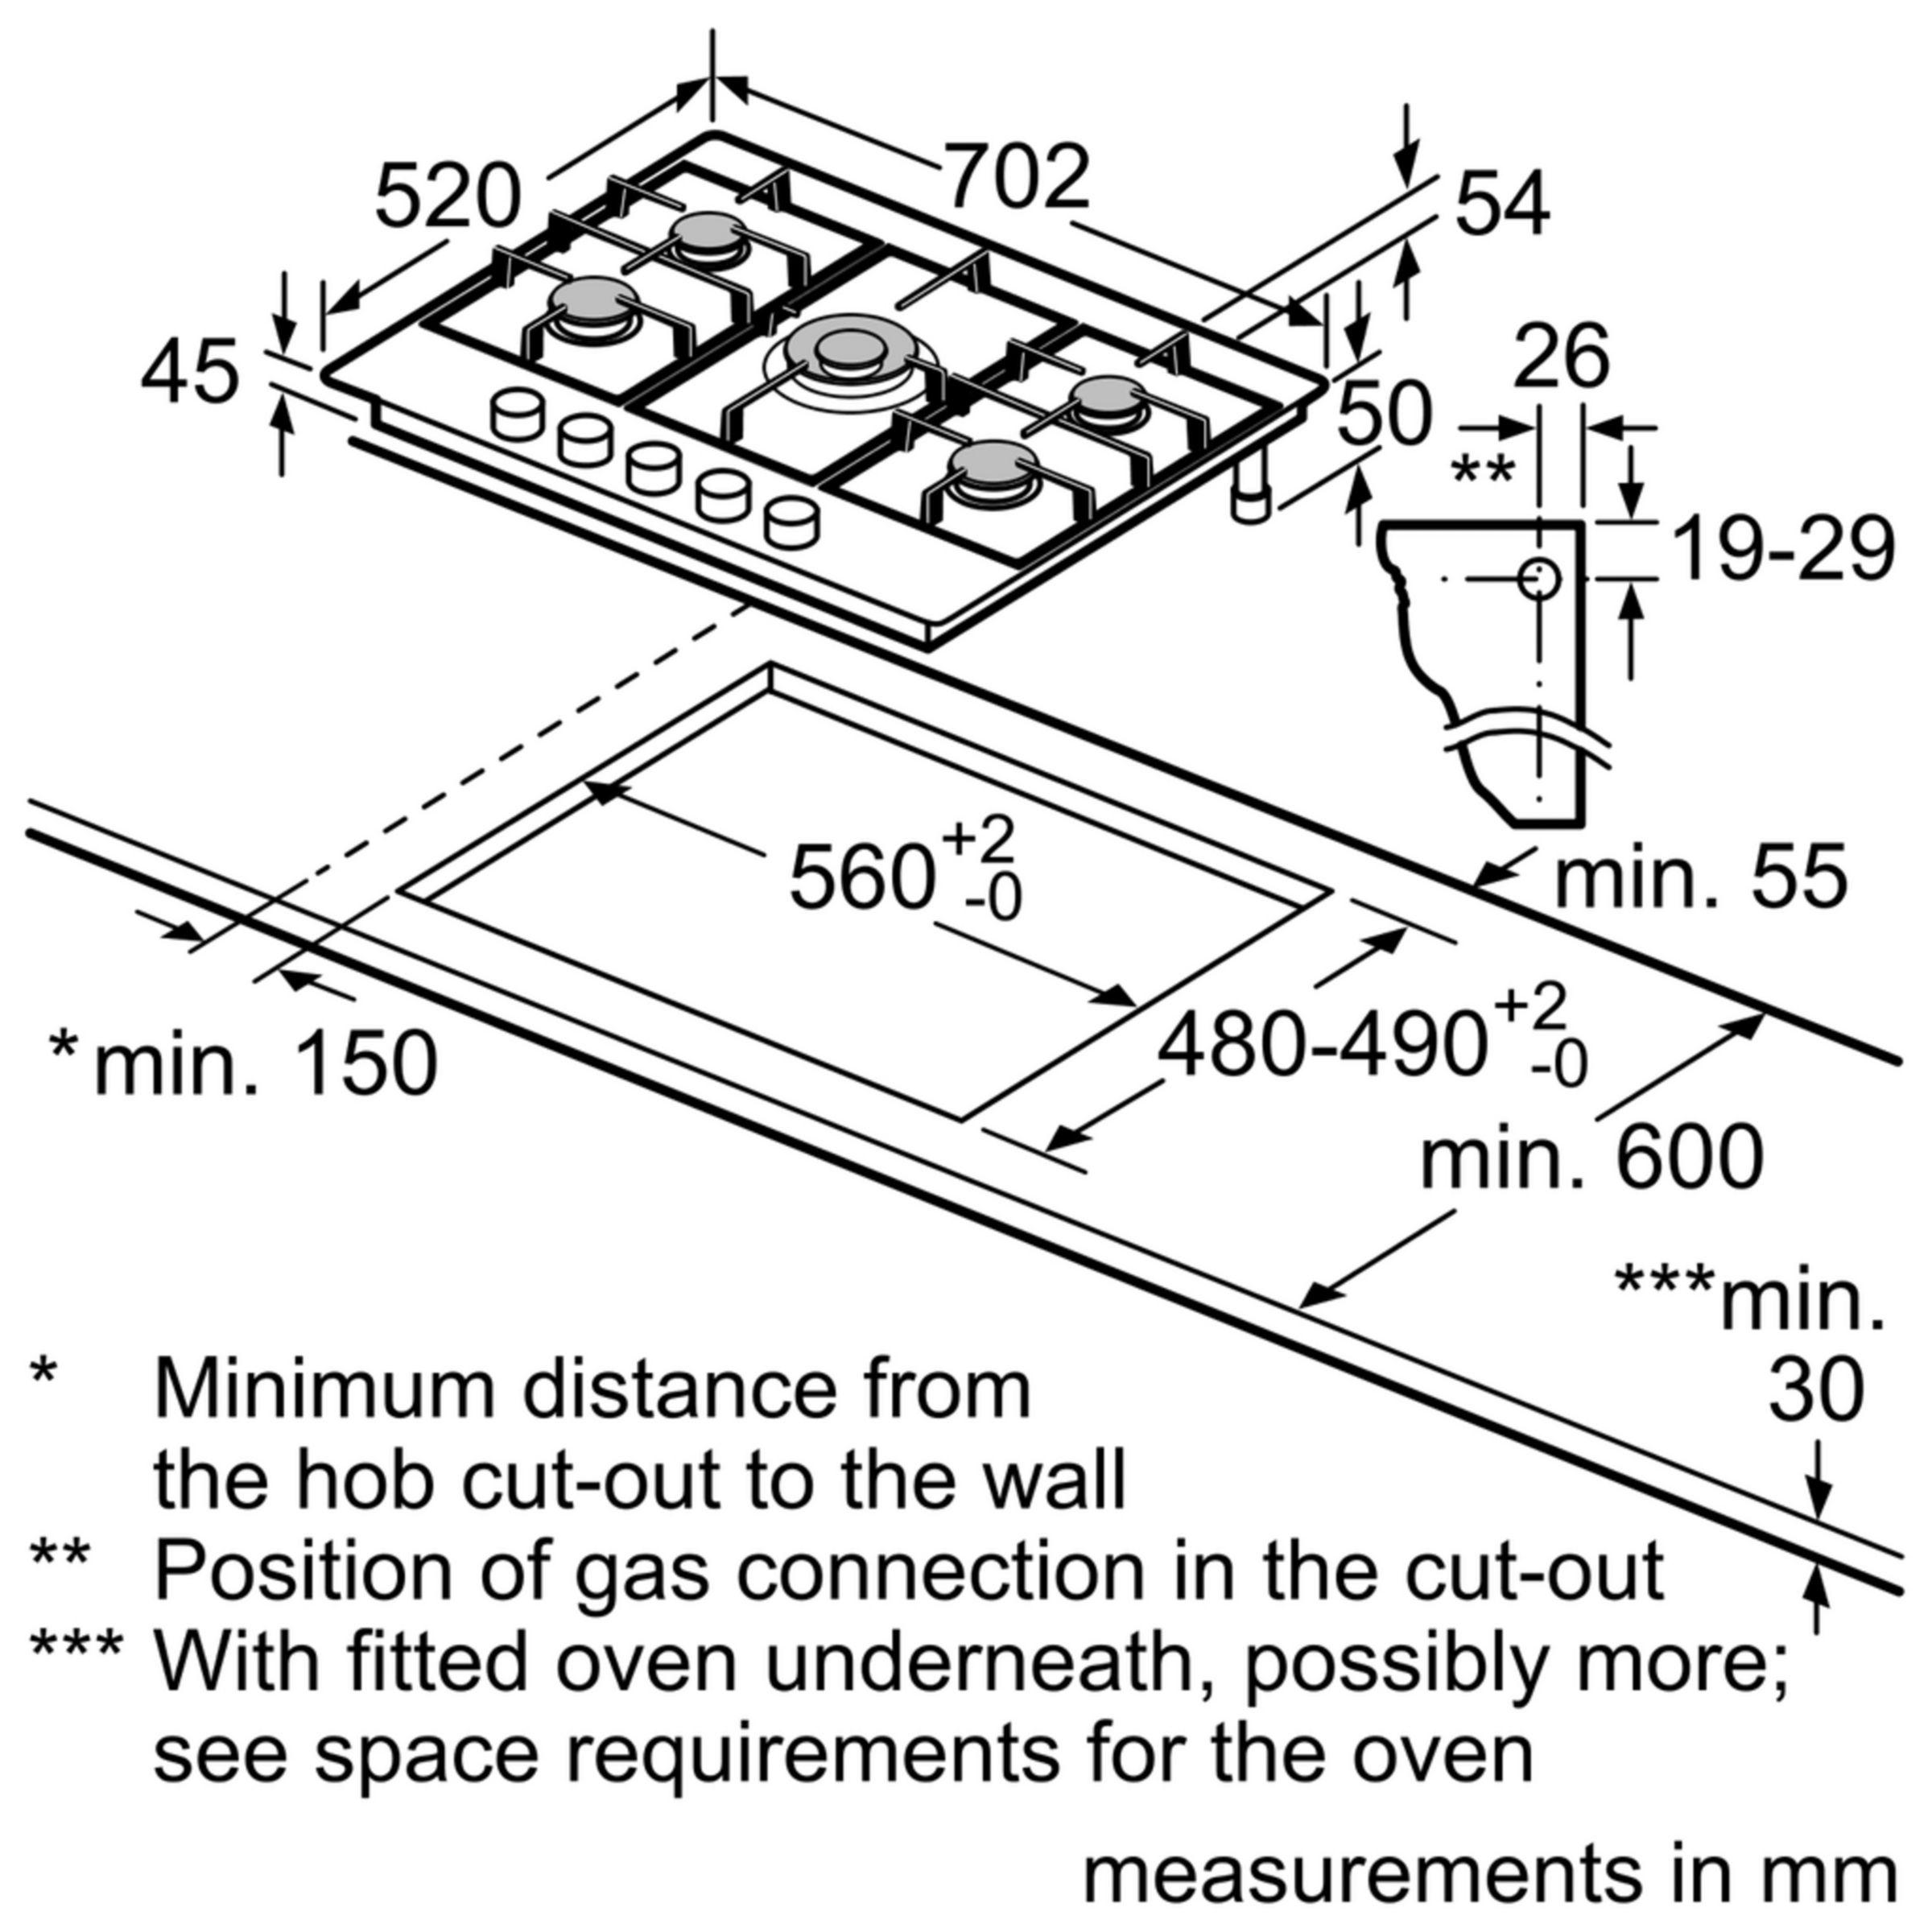 neff t25s56n0gb gas hob stainless steel at john lewis partners basic light wiring diagrams neff hob wiring diagram [ 1440 x 1920 Pixel ]